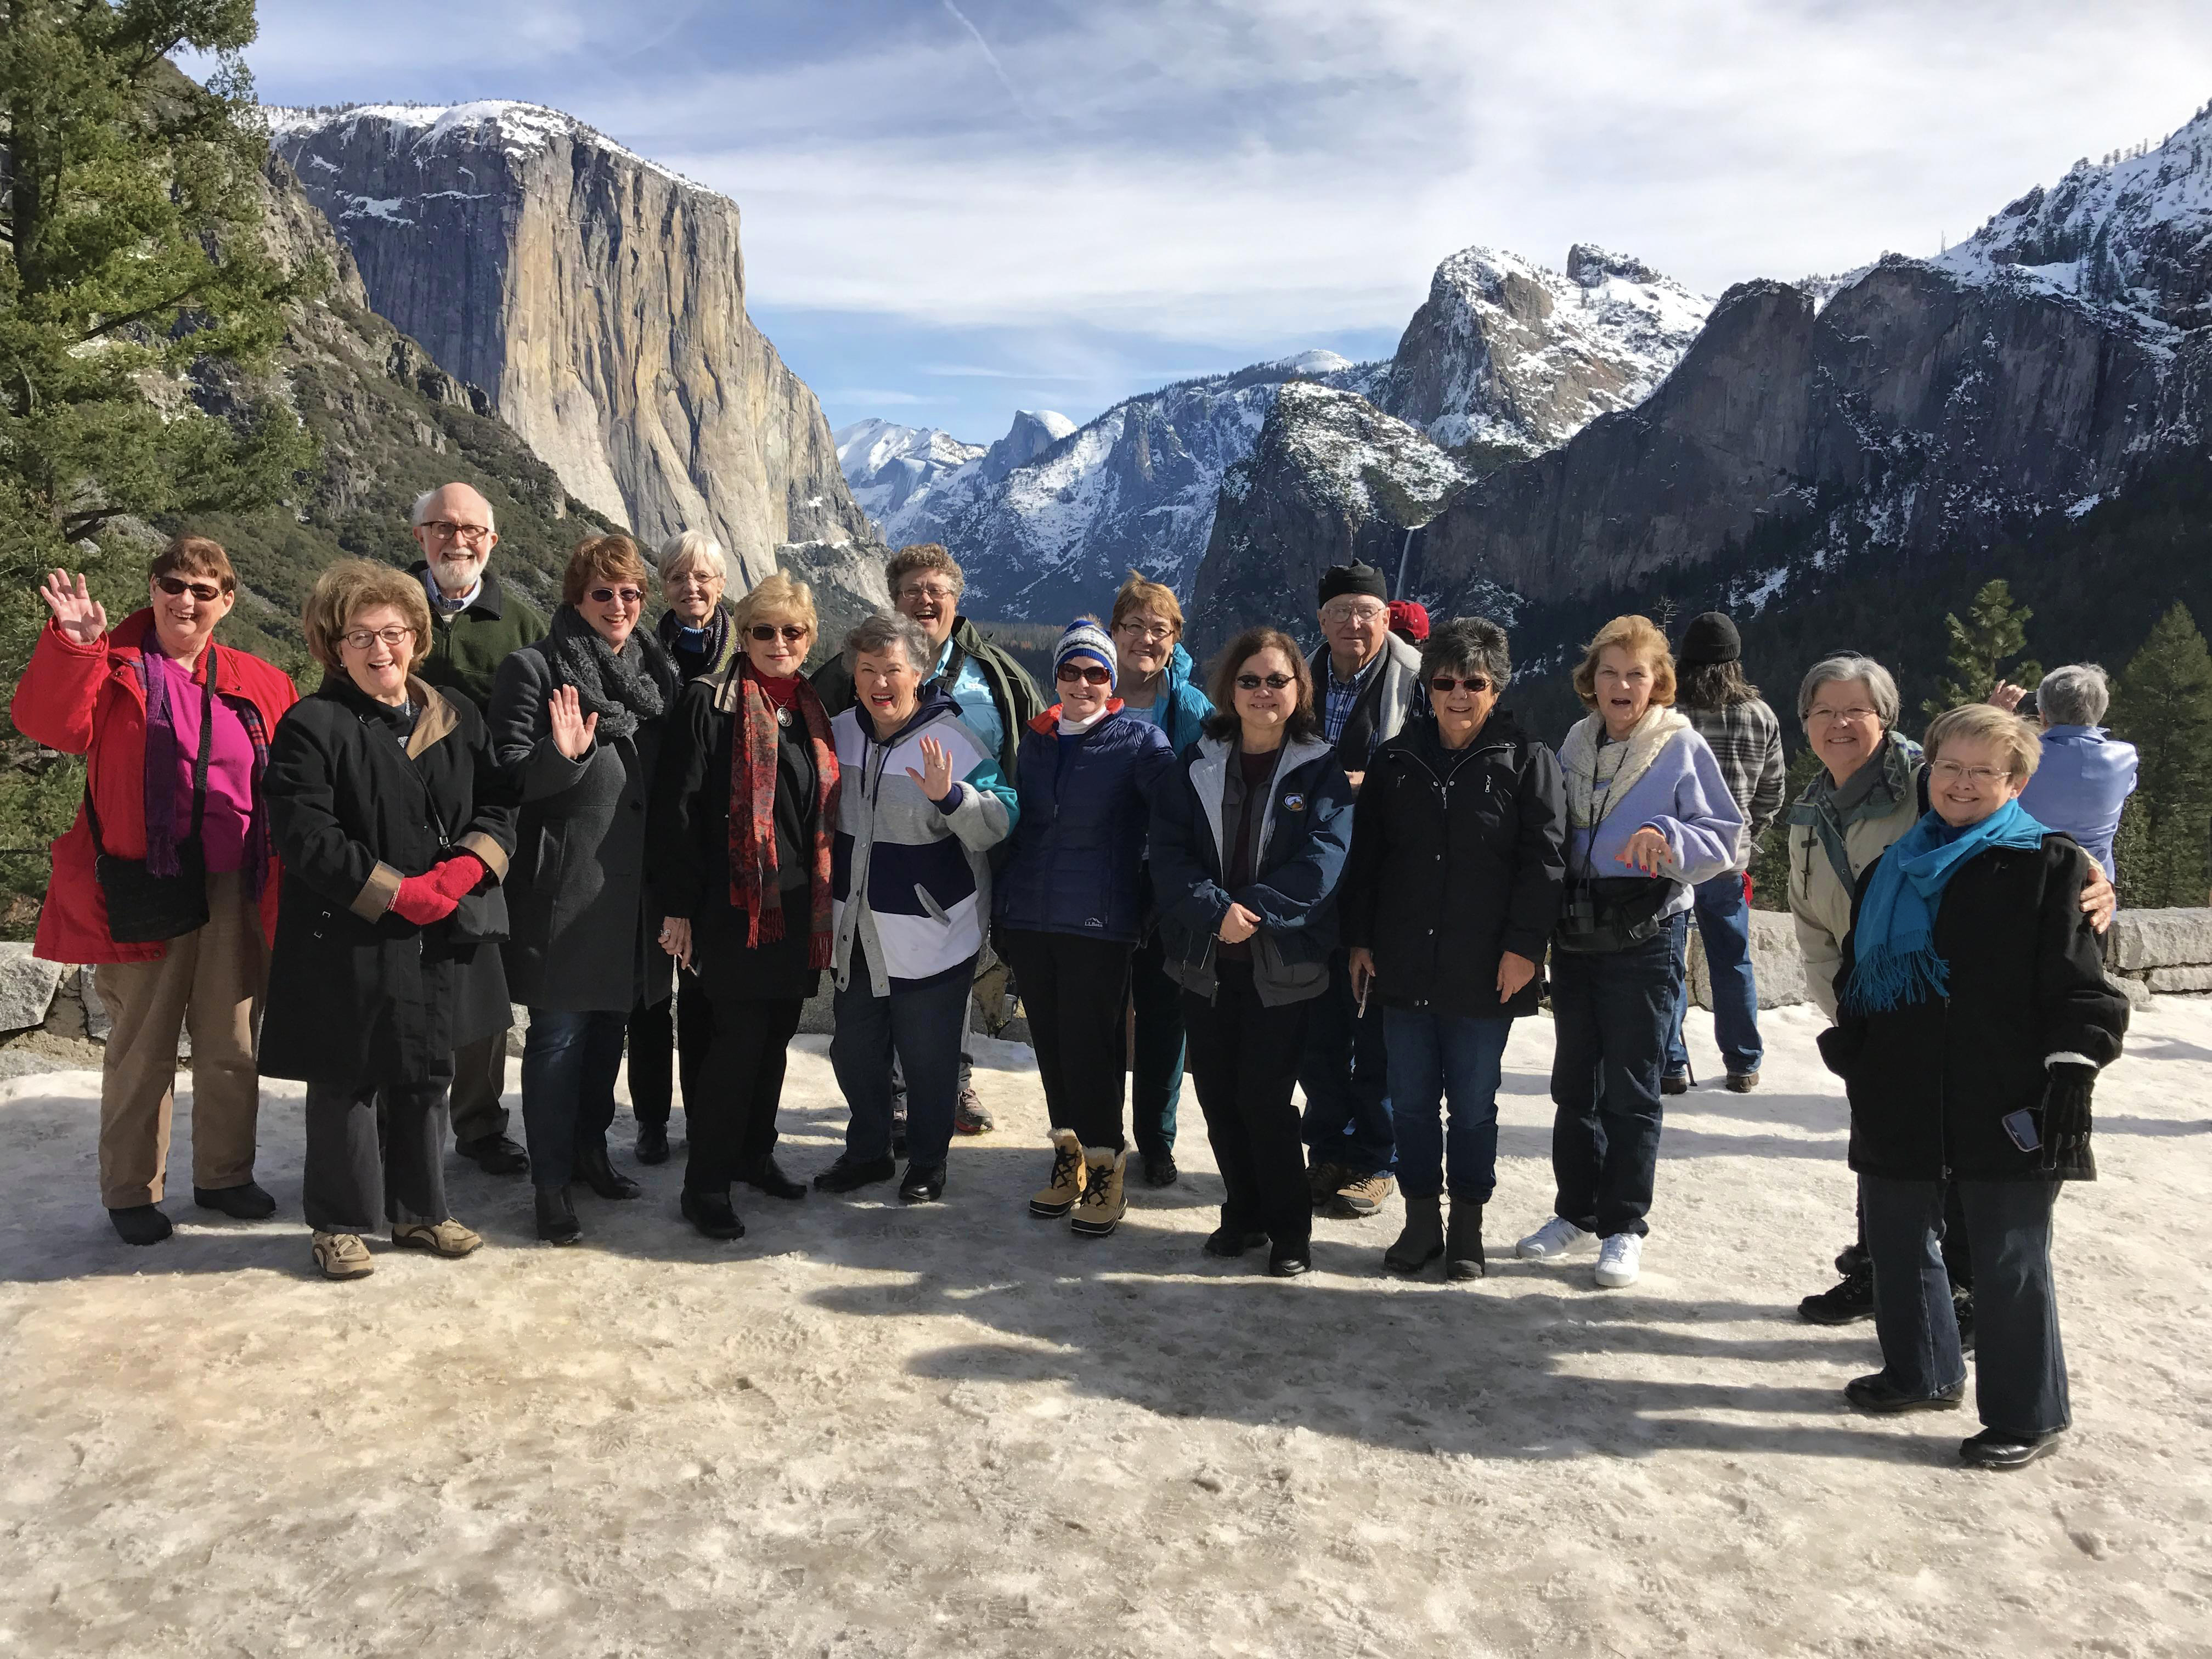 Sports Leisure travelers in Yosemite